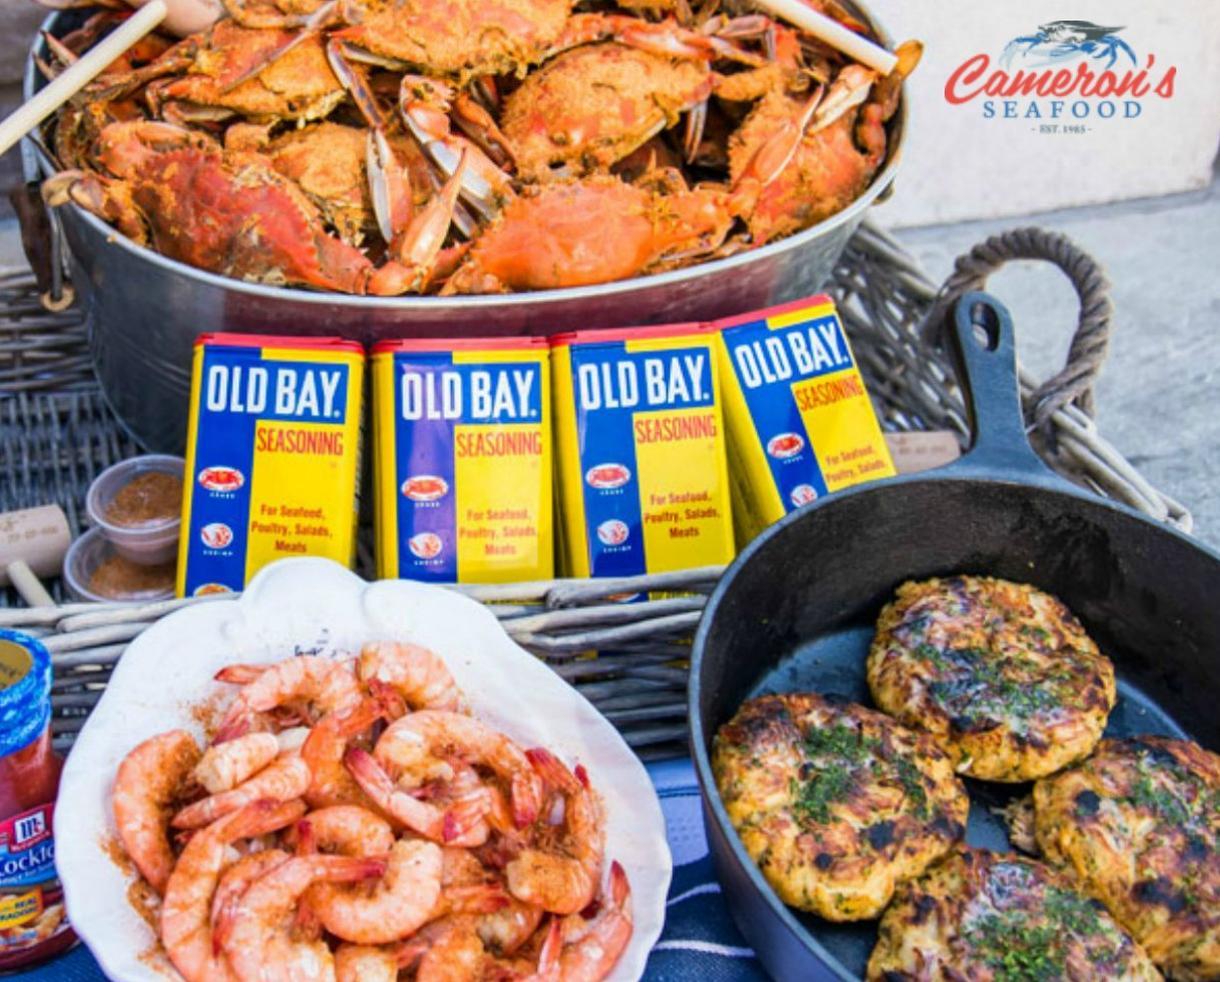 Ultimate Crab Feast! Half Bushel of Steamed MD Crabs, Steamed Shrimp, Crab Cakes, Crab Bisque & More!